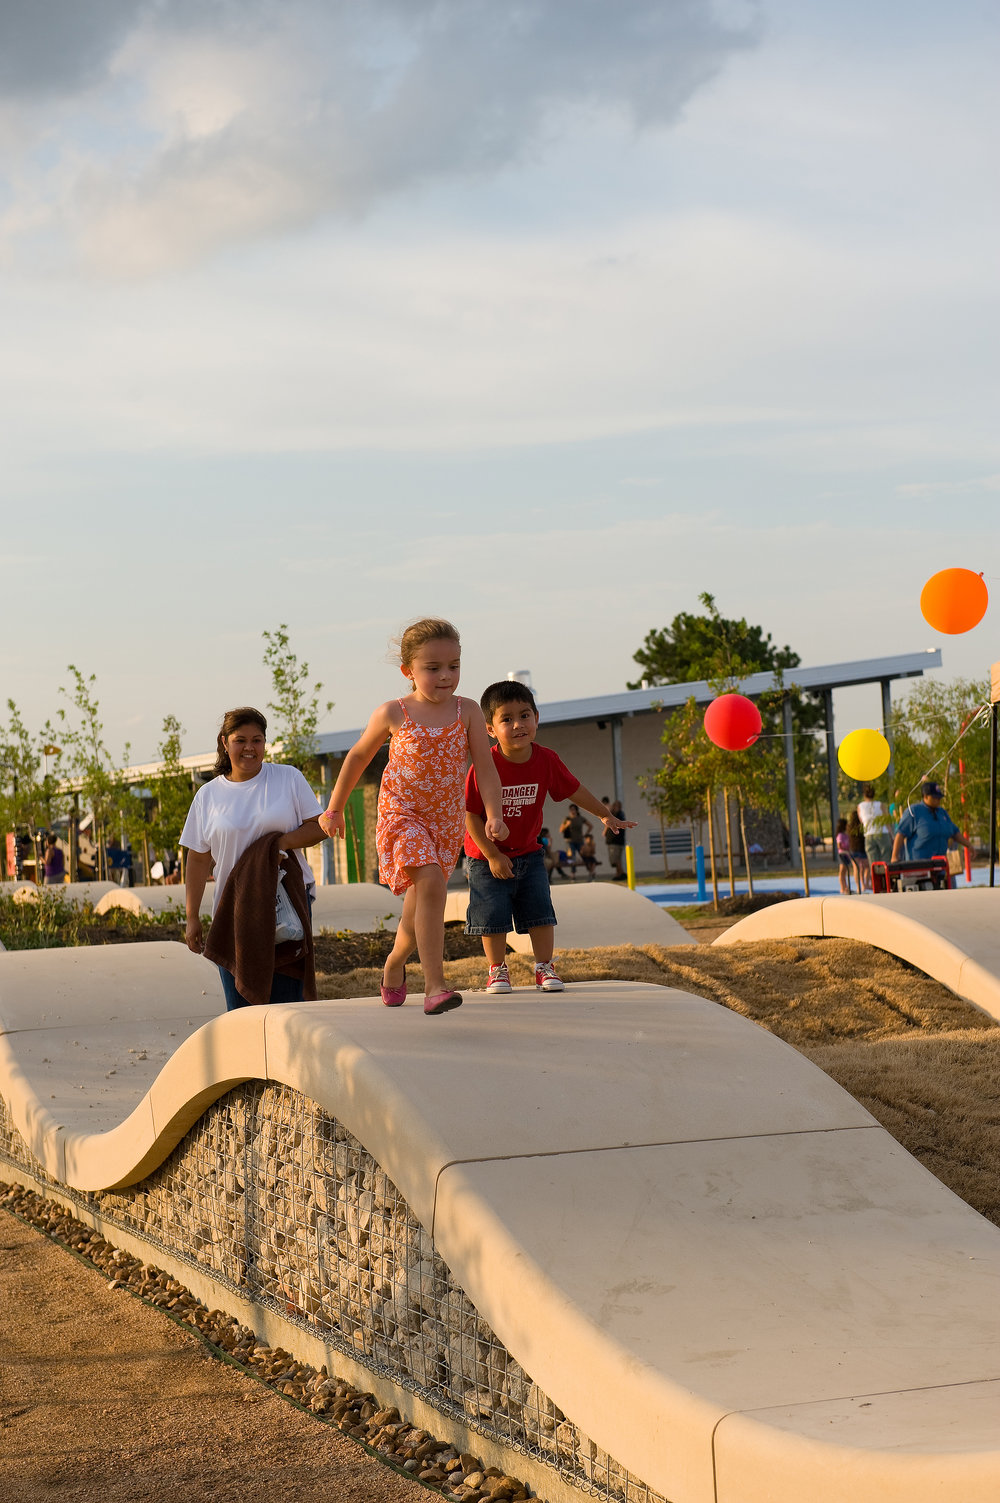 Gene Green Beltway 8 Park.Image: Asakura Robinson